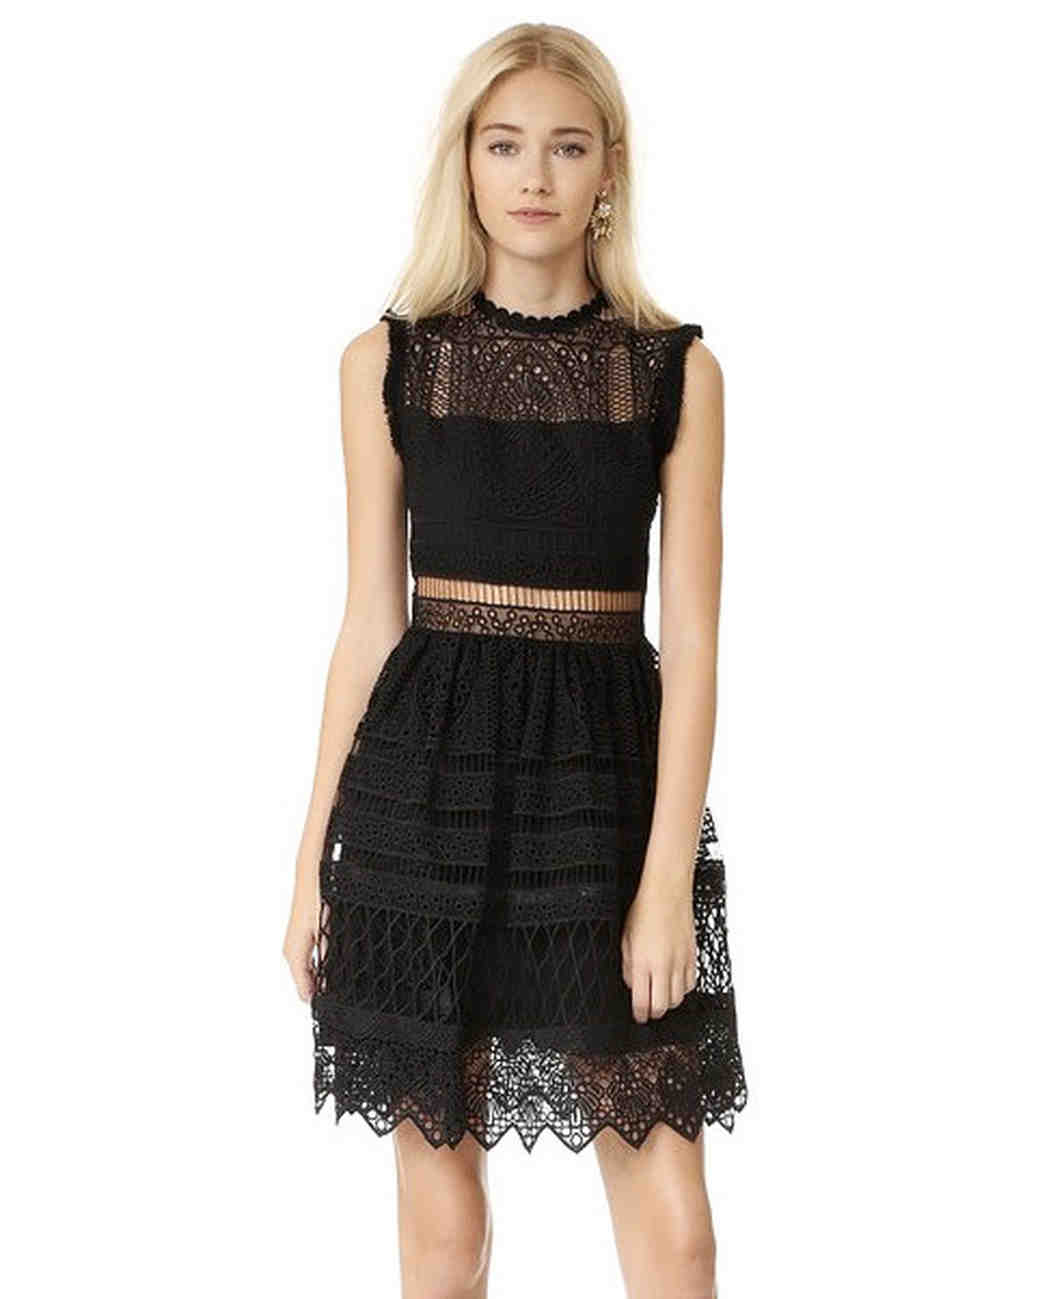 peek-a-boo-bridesmaid-dress-alexis-sage-embroidered-0117